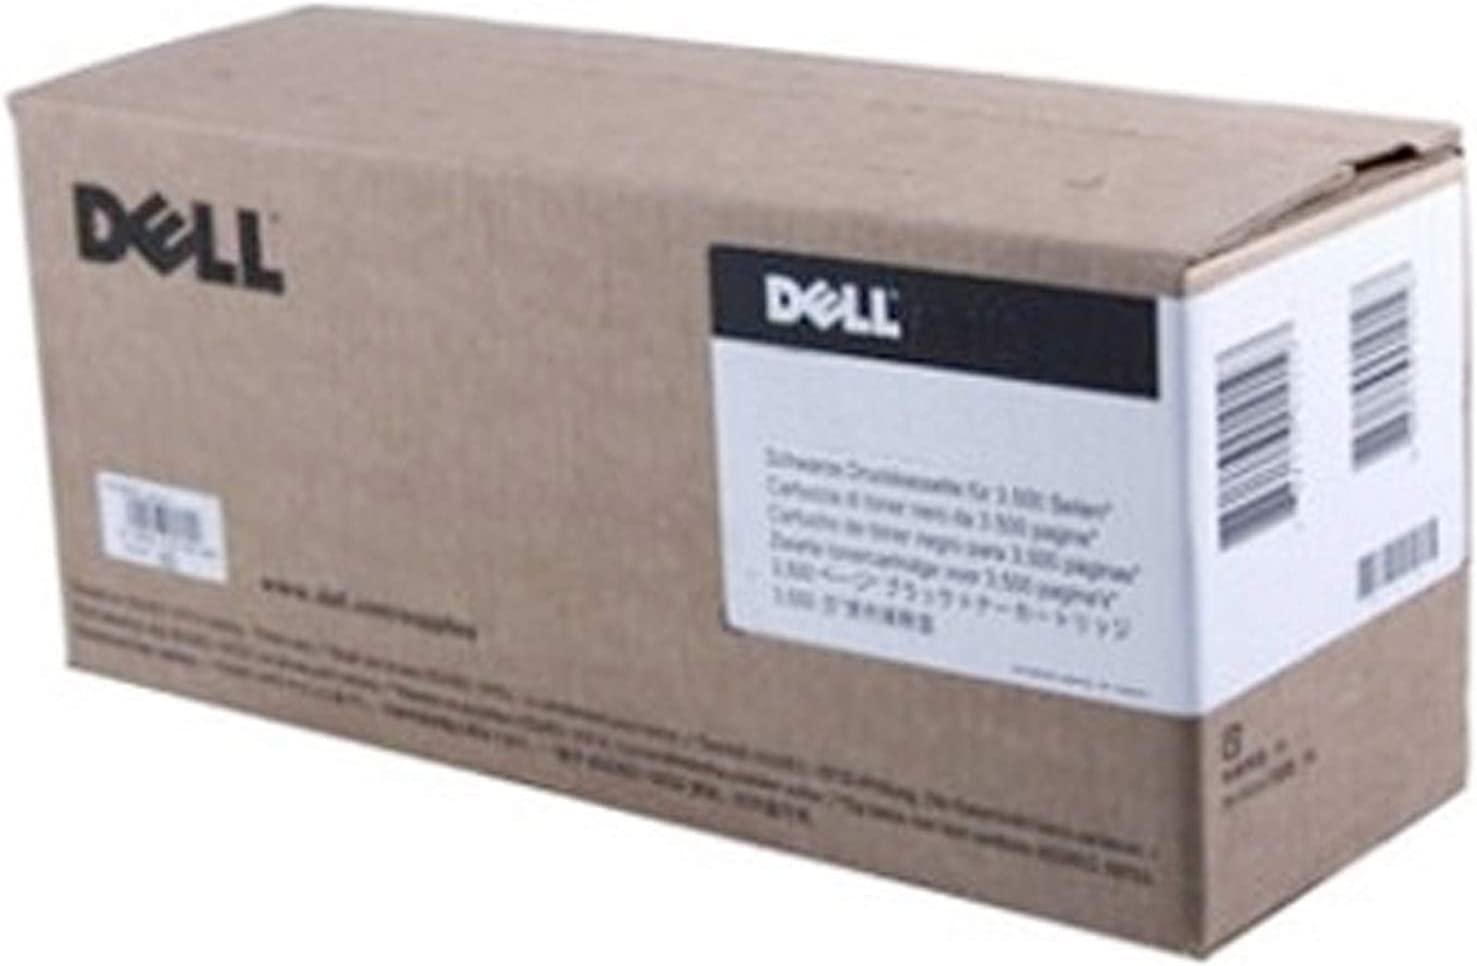 S2830 High Yield Black Toner Cartridge,